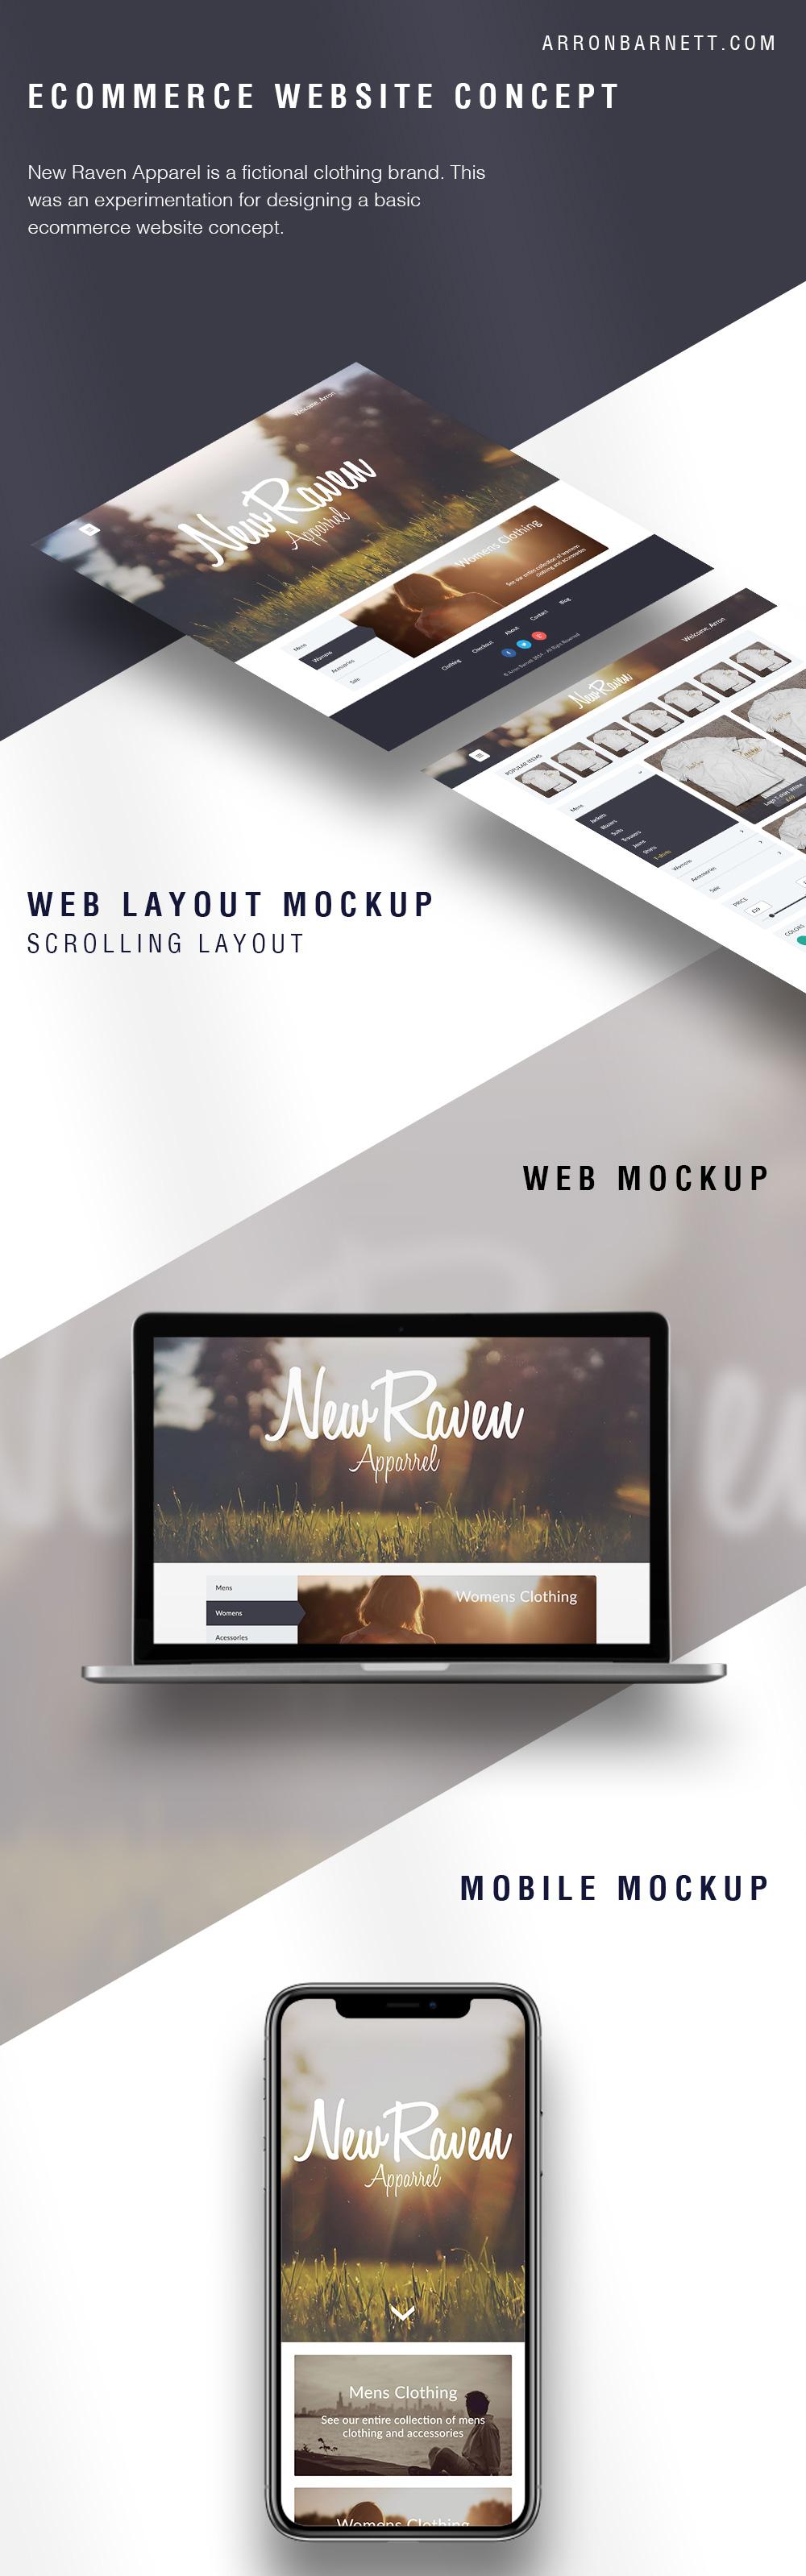 Ecommerce Website Concept